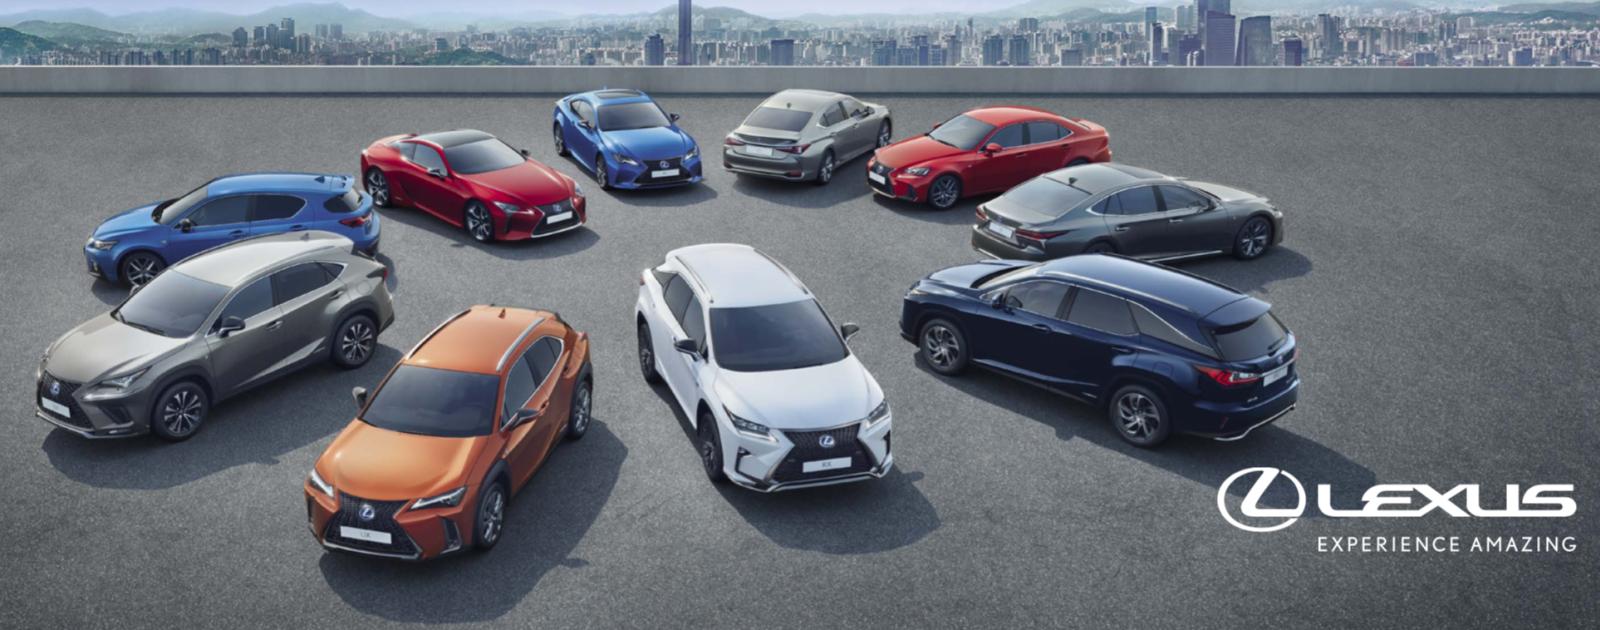 Lexus_hibrid_kinalat